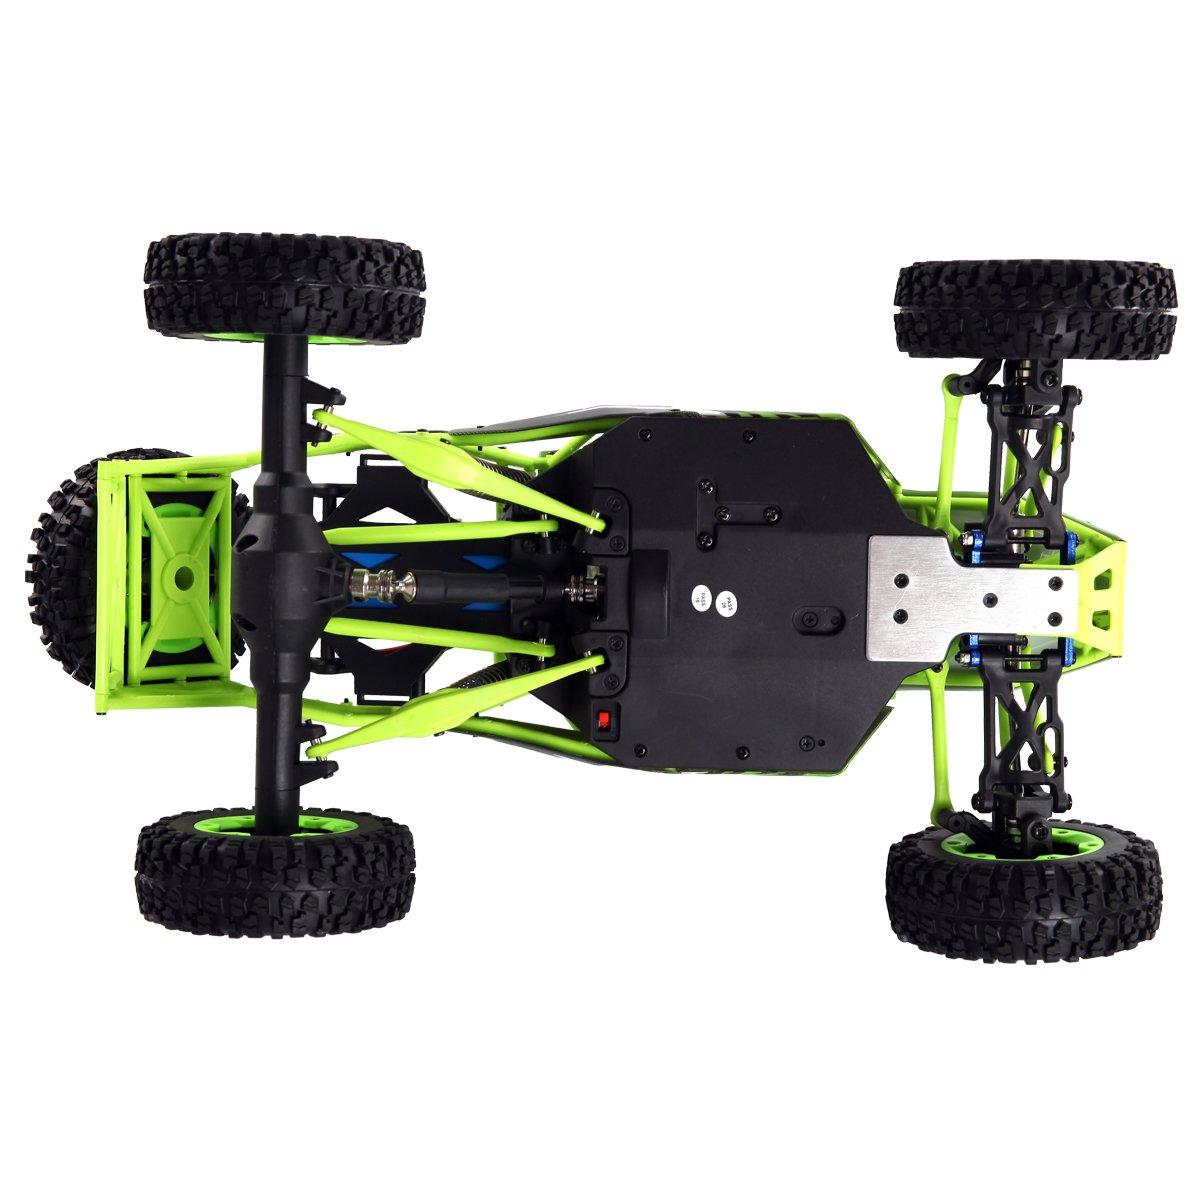 Costzon 112 24g Rc Off Road Racing Car Radio Remote Brand Name Waterproof Gptoys Item Circuit Board Control Rock Crawler Truck Rtr Toys Games